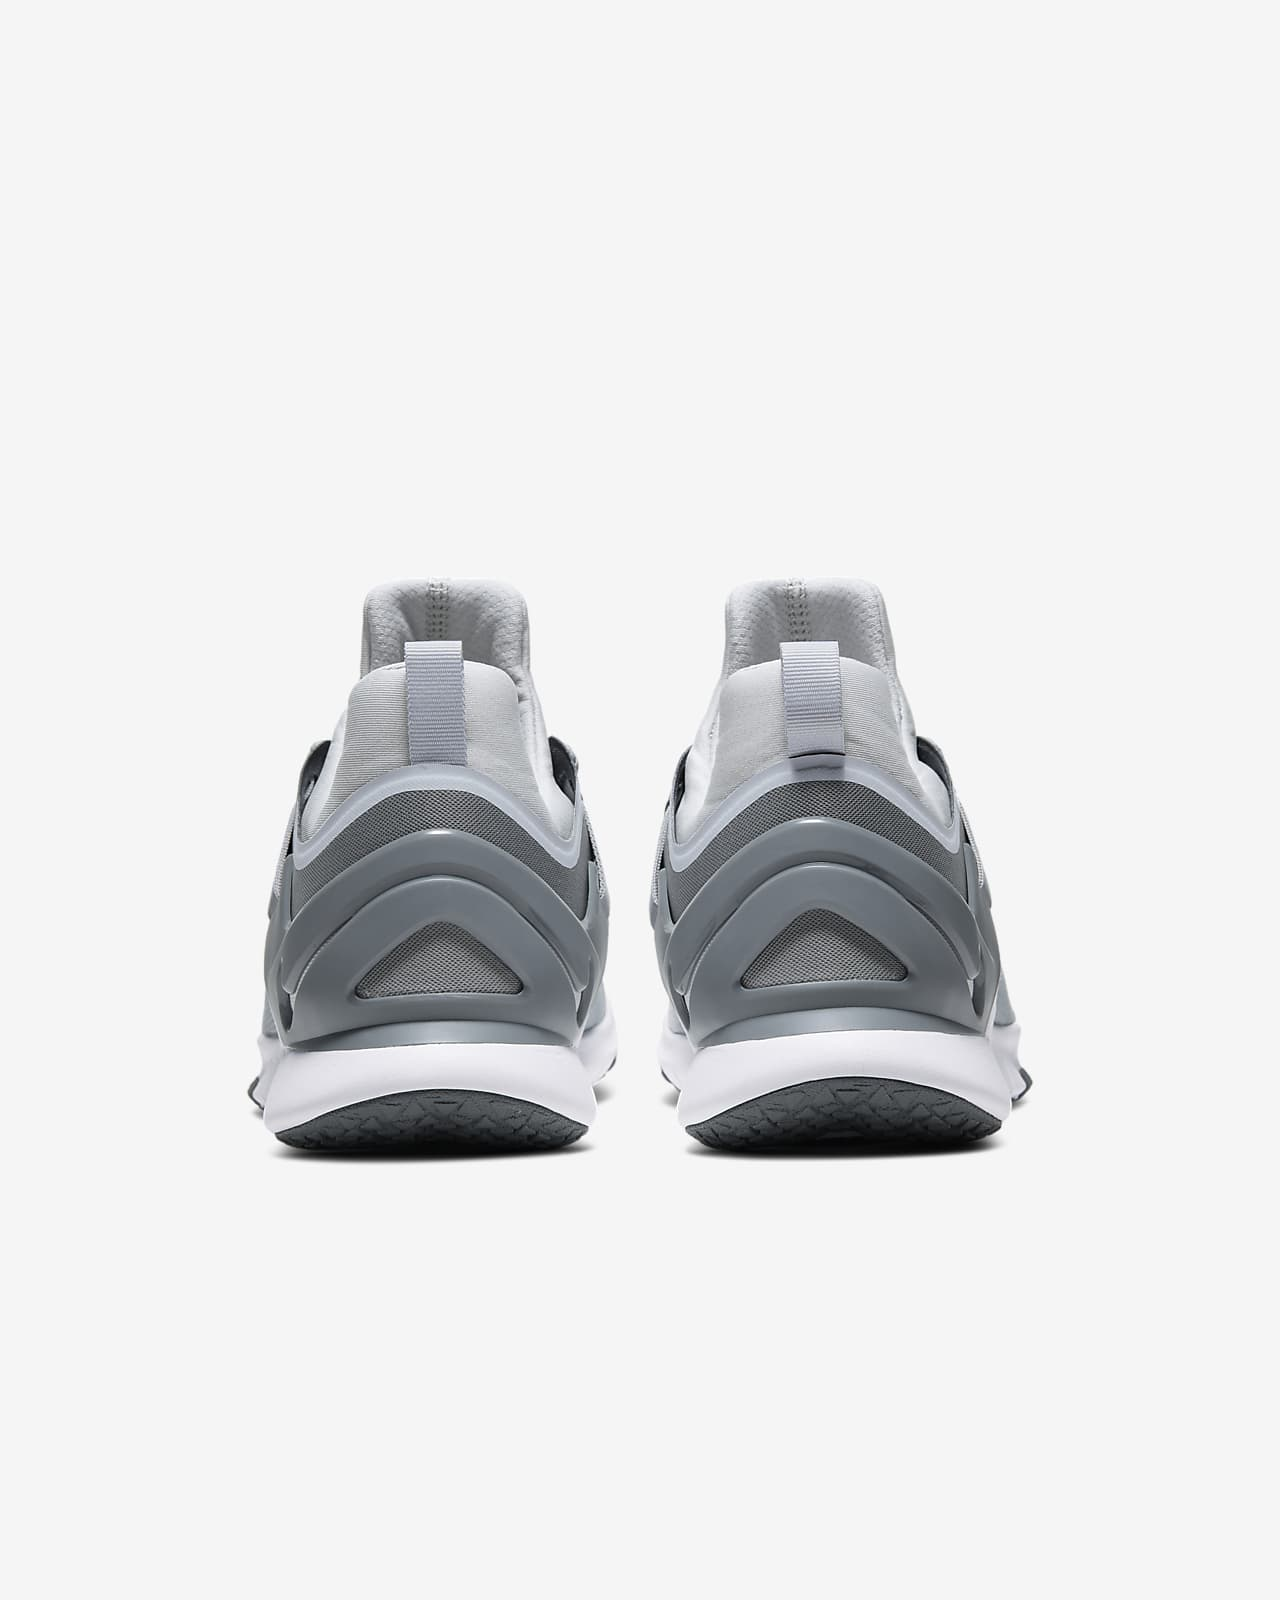 Negligencia fuego ayudar  Calzado de entrenamiento para hombre Nike Flexmethod TR. Nike.com